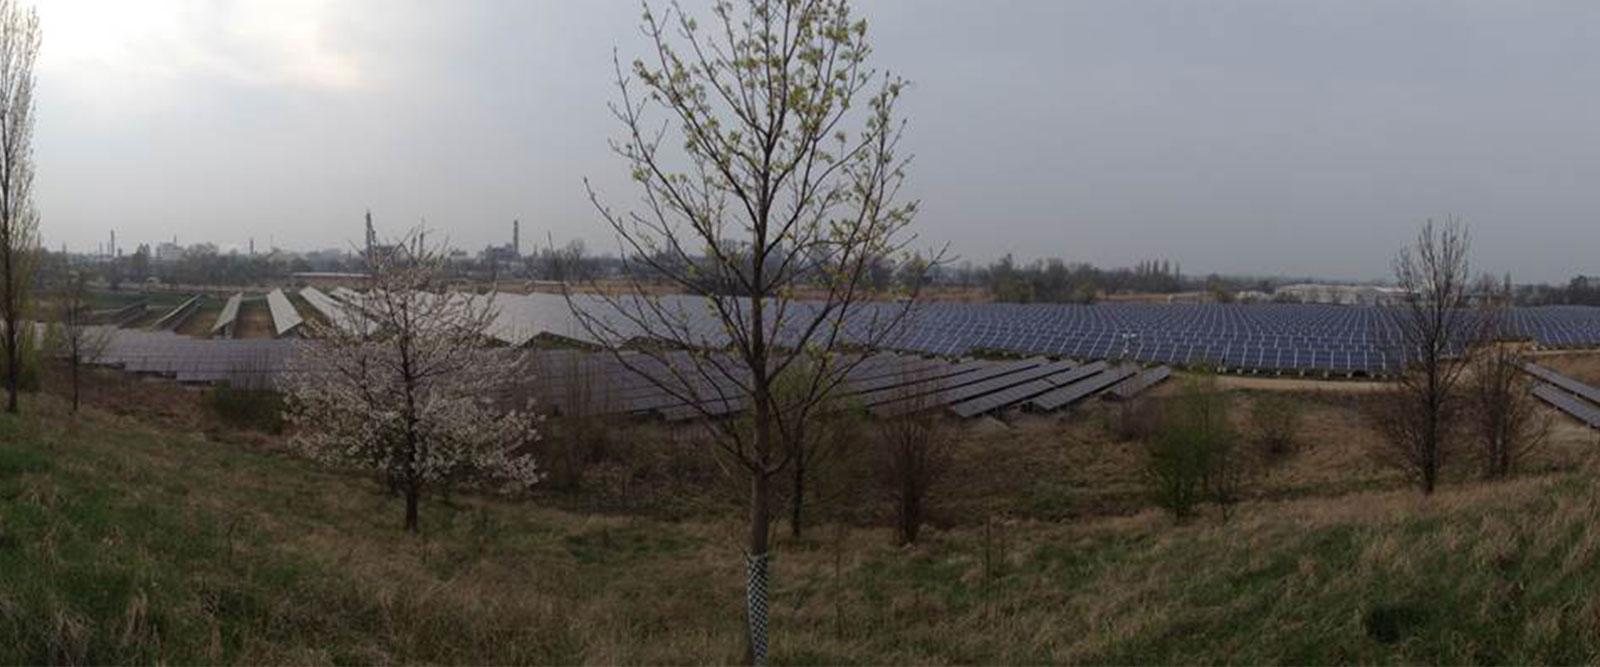 Solarpark_01